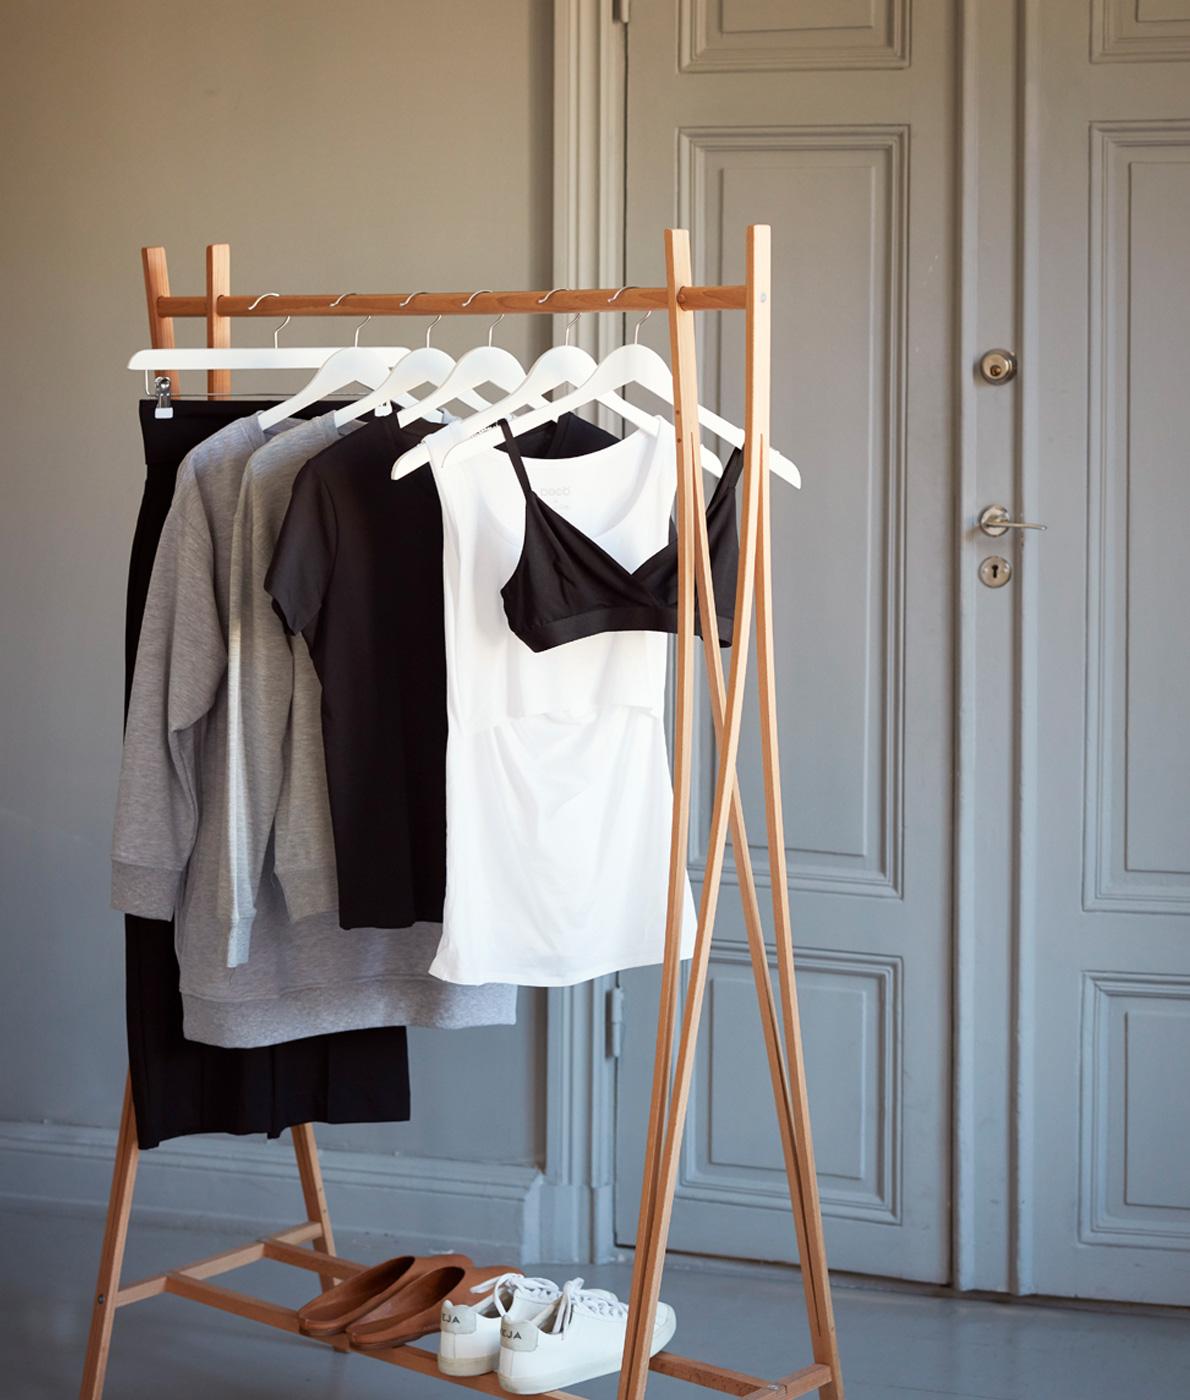 Lang lebe deine Kleidung